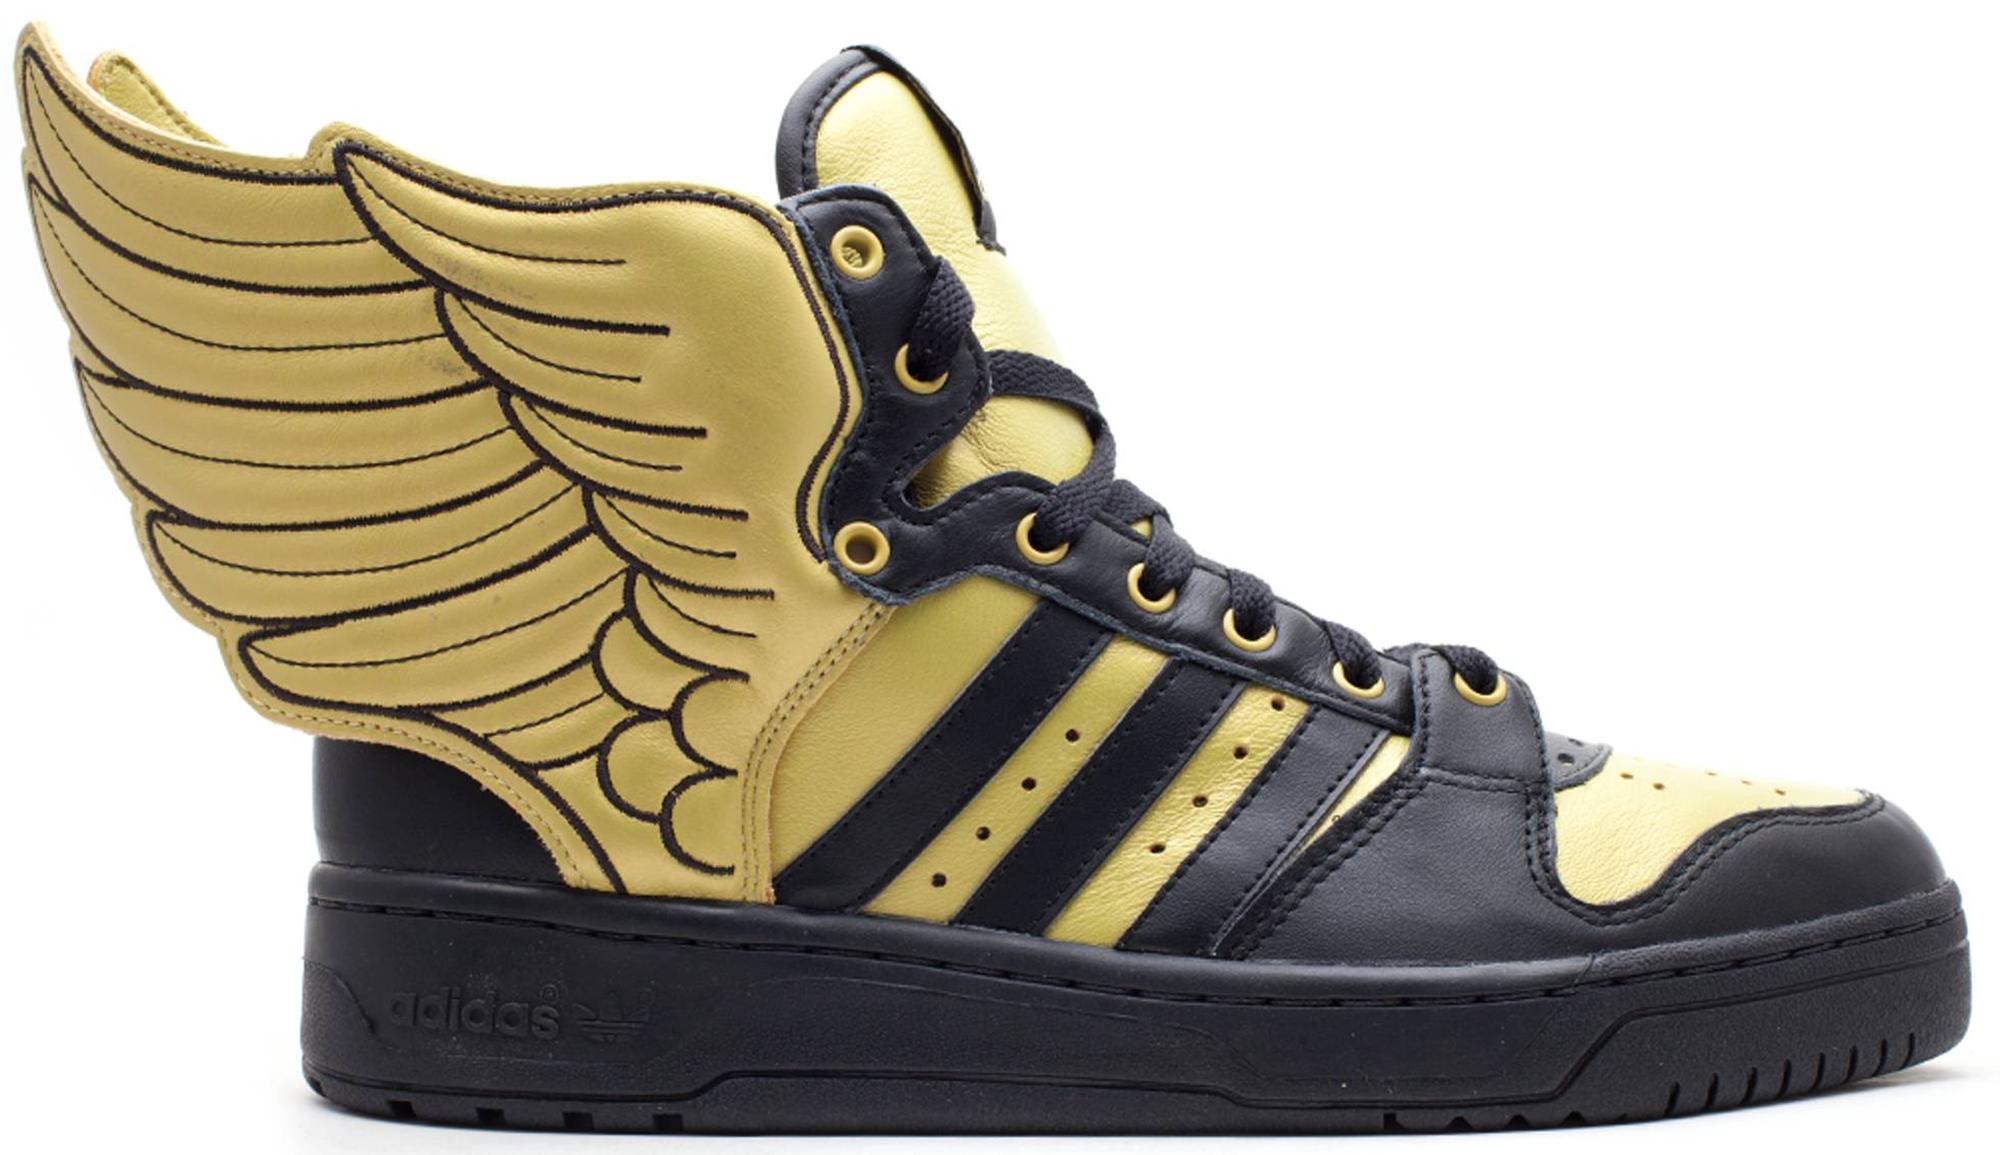 adidas JS Wings 2.0 Black Gold - G44824